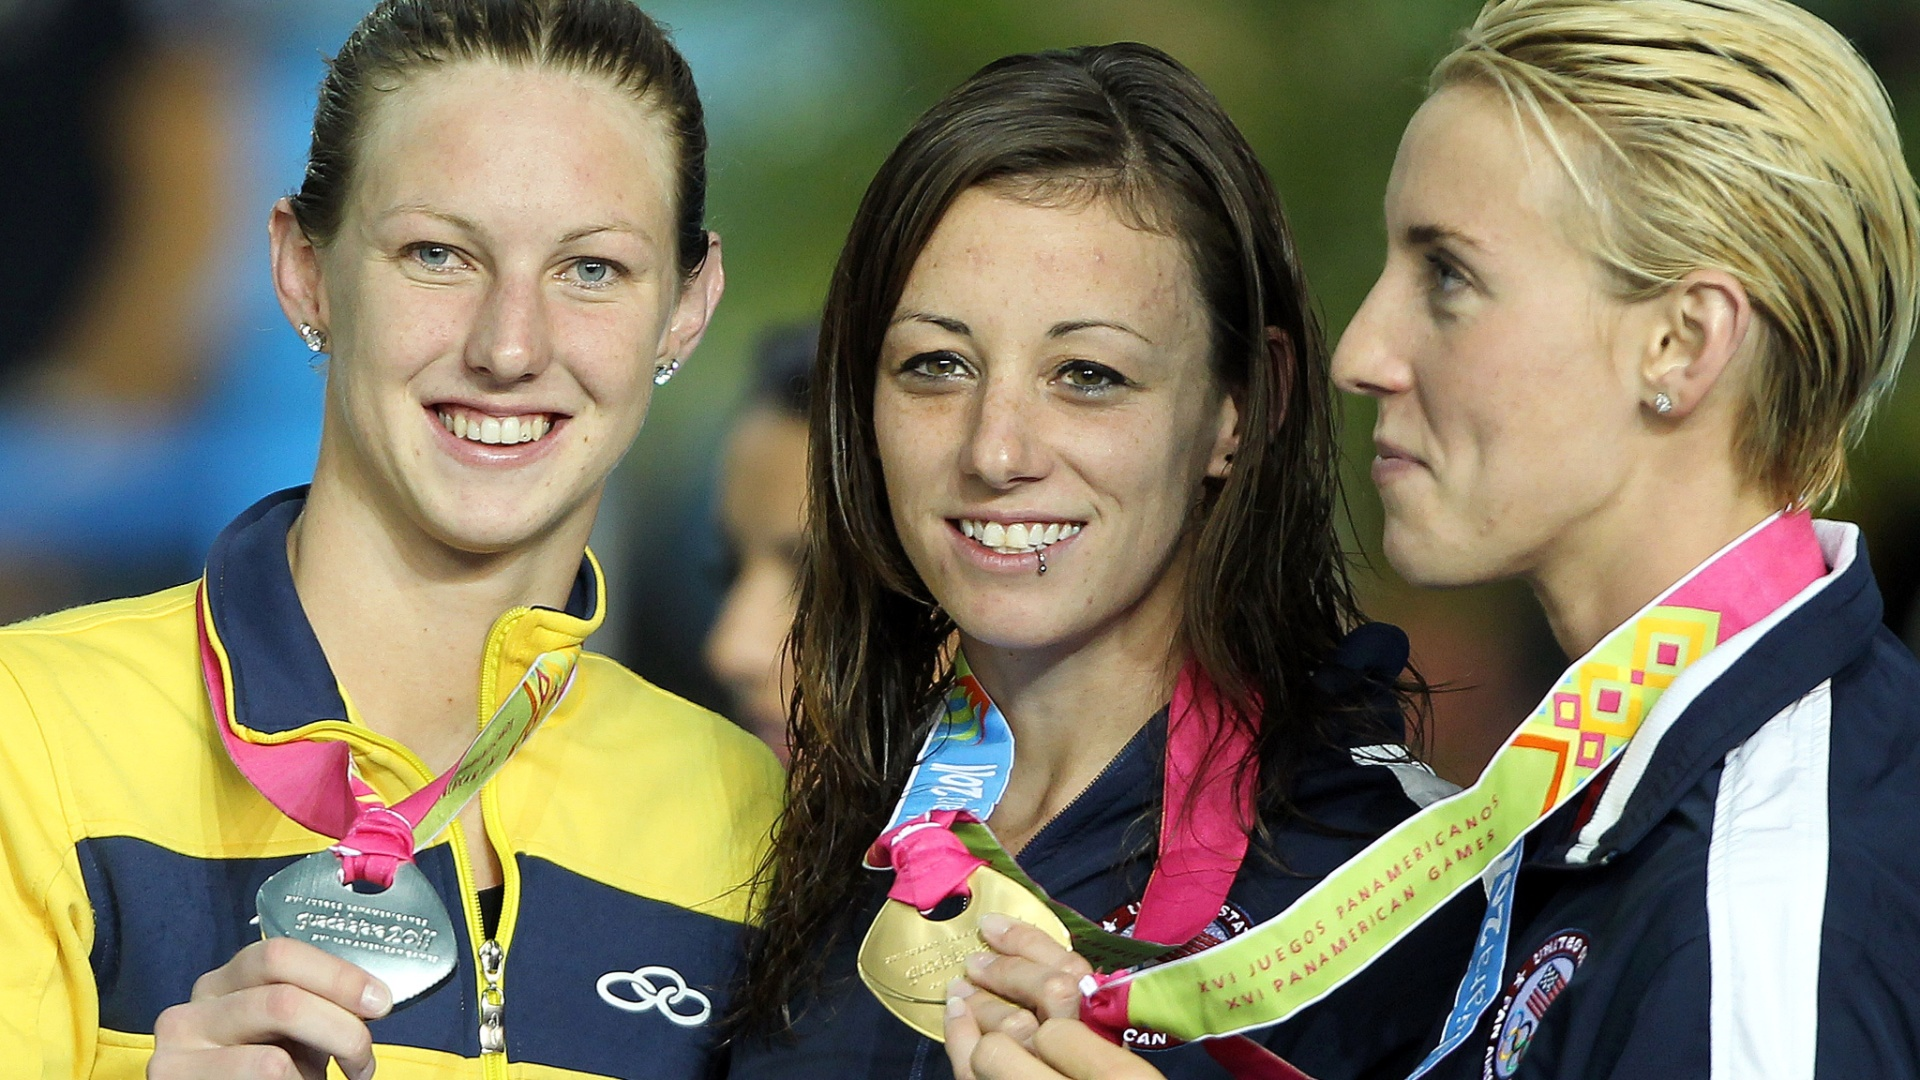 Gracielle Hermann comemora a prata nos 50 m livre no Pan de Guadalajara (21/10/2011)